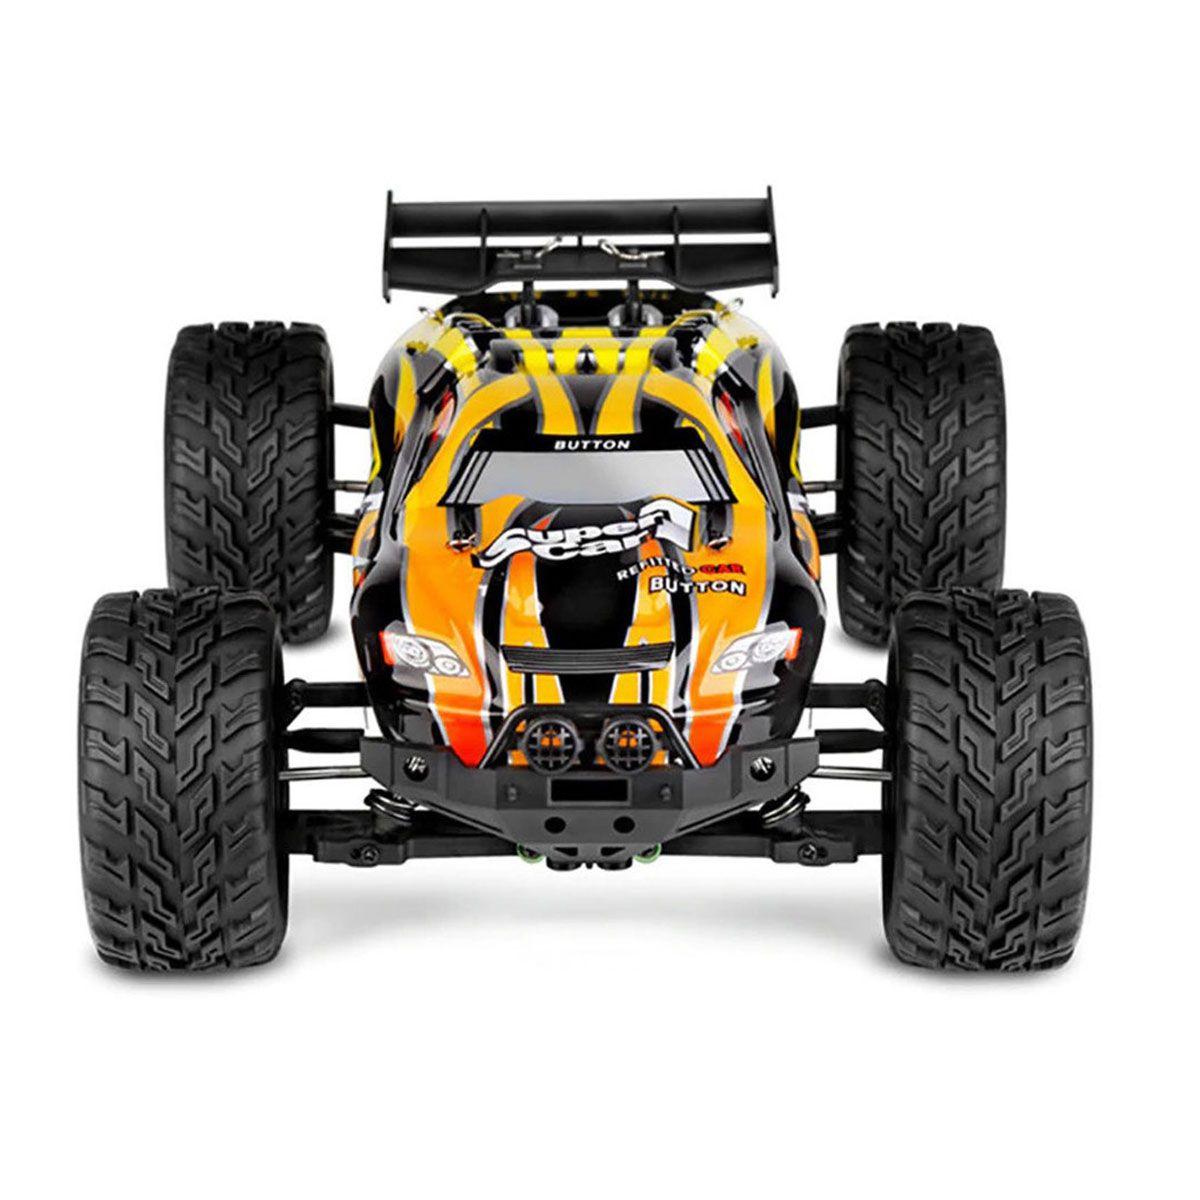 Carro De Controle WLToys Off Road 4x4 Buggy 1/12 45km/h